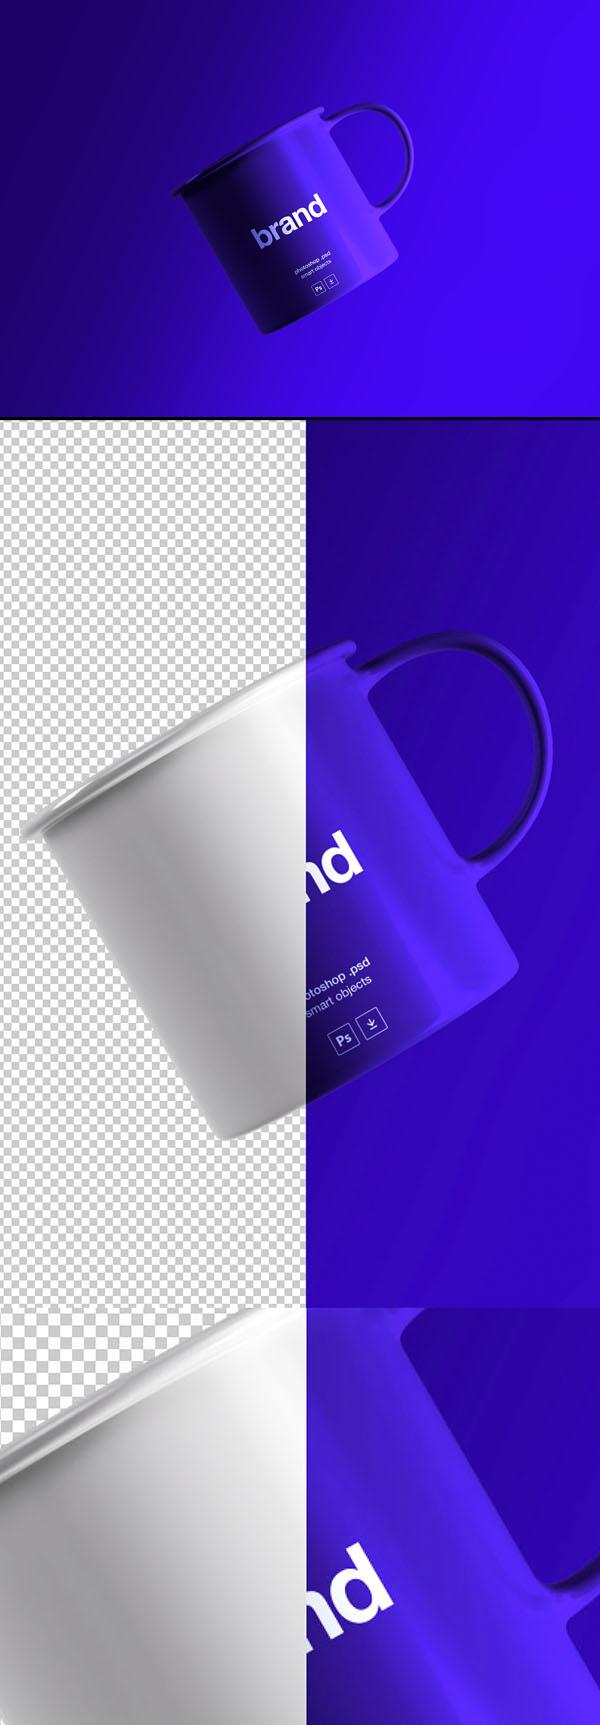 Beautiful Free Tea Cup Mockup PSD